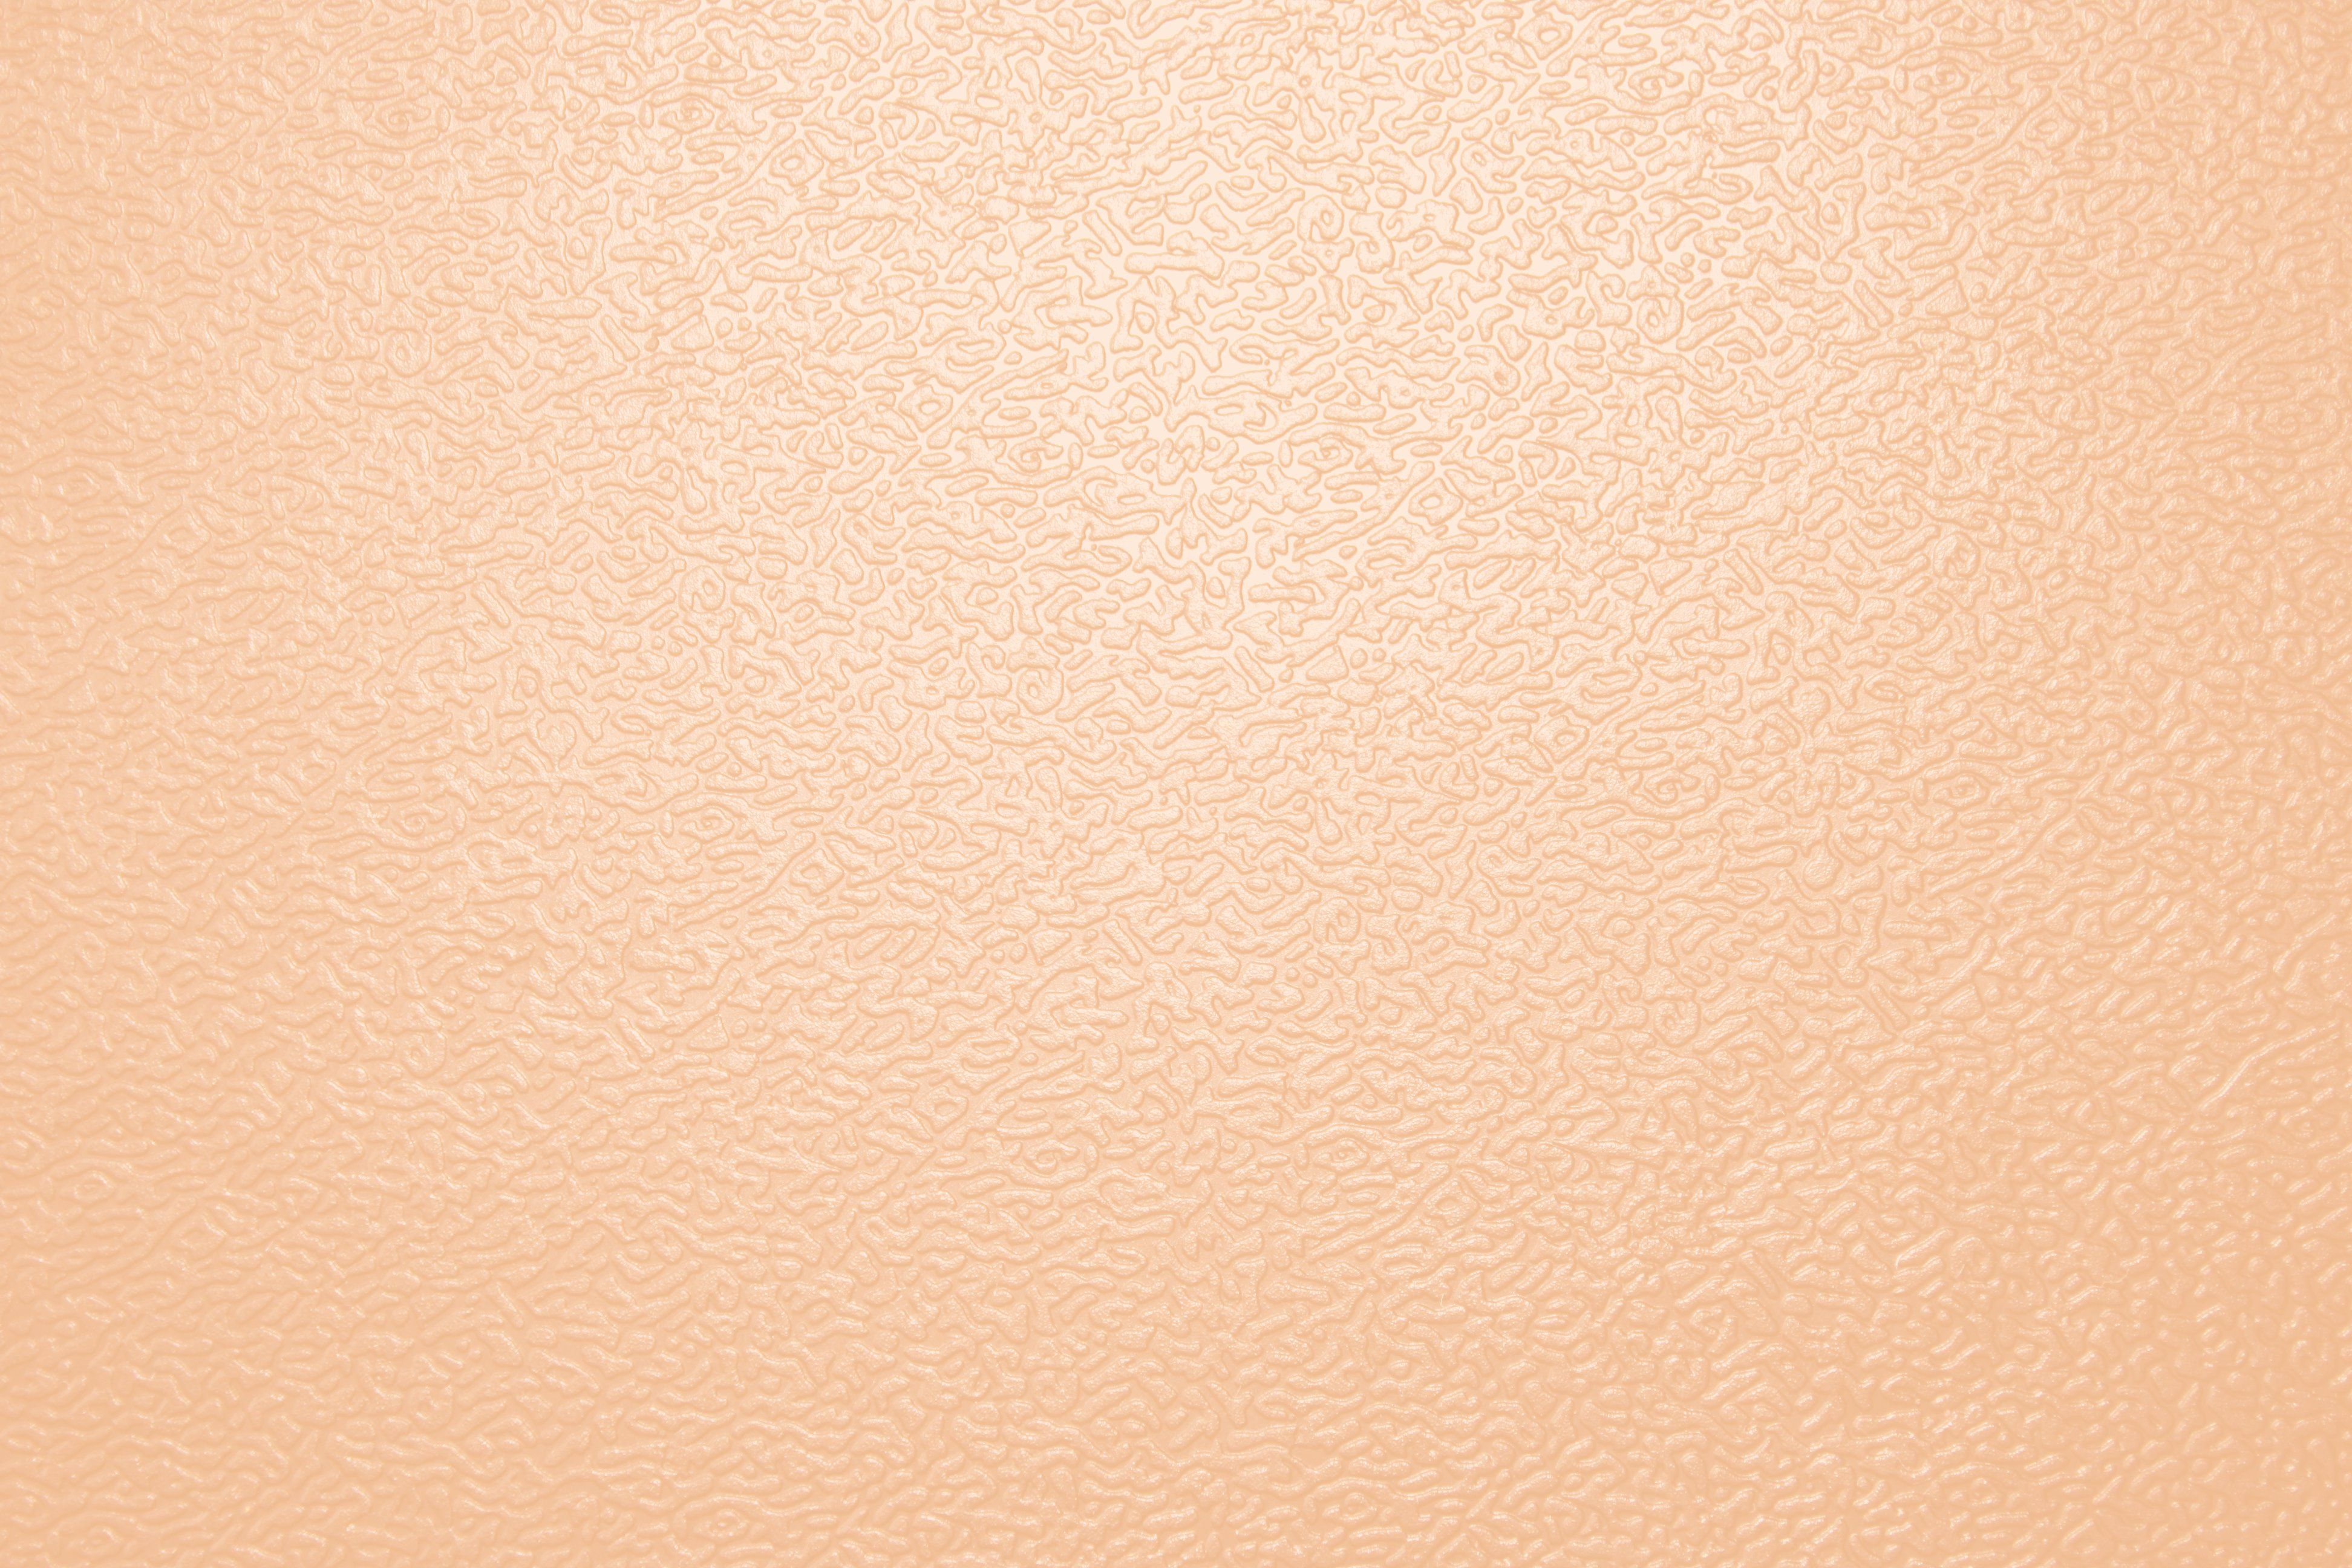 Eeek Room Color Light Peach Color Peach Colors Free Photographs